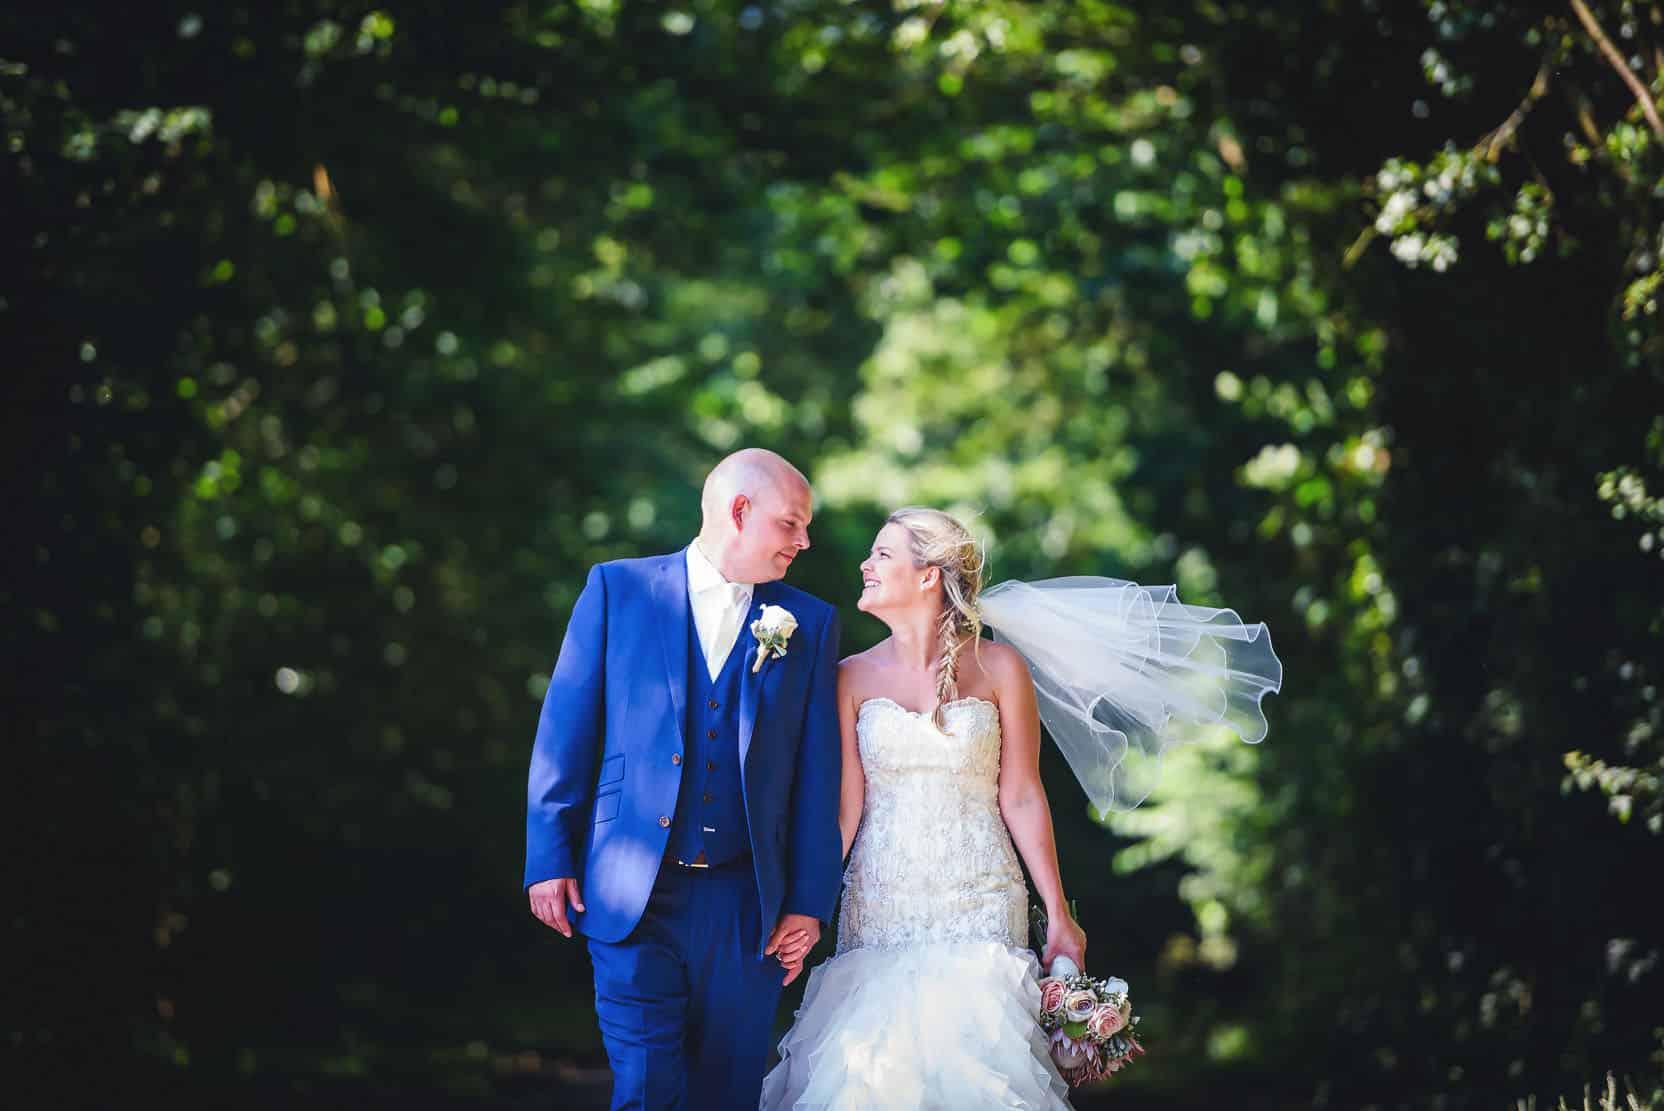 032b_Maidens_Barn_Wedding_Essex_NJ_Justin_Bailey_Photography